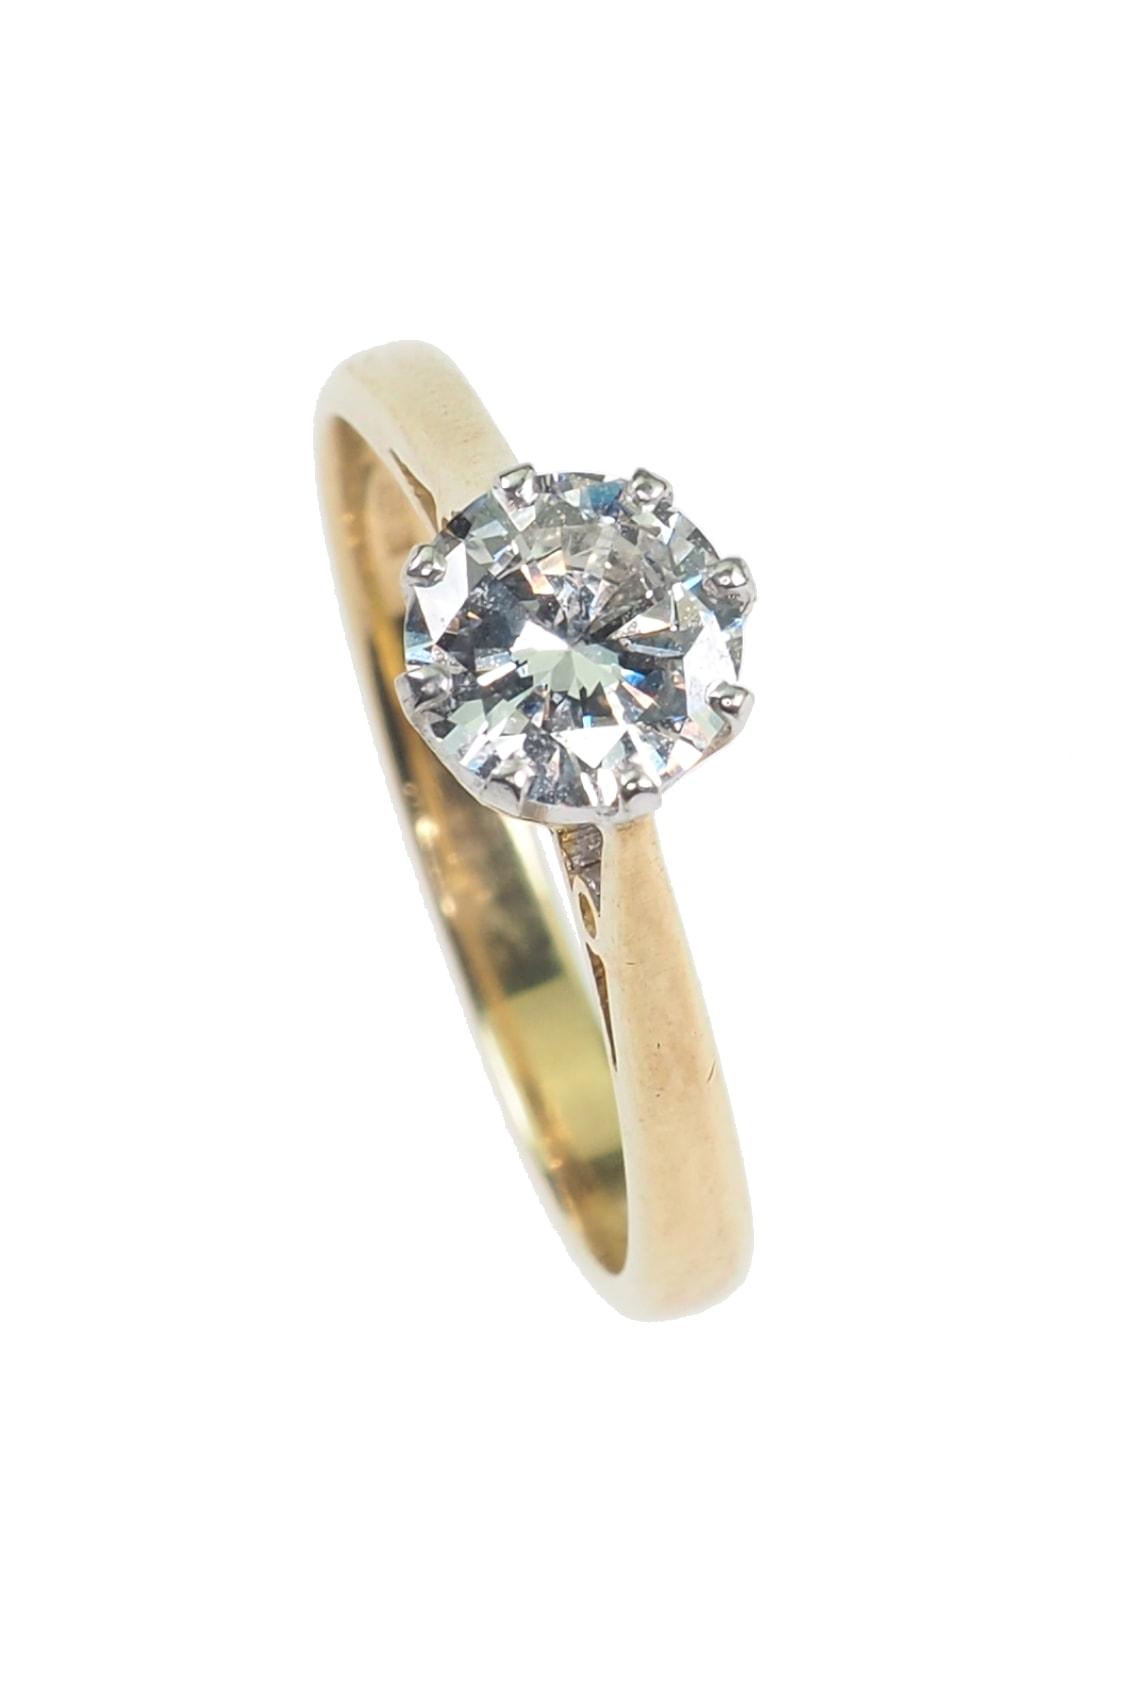 zertifizierten-Diamantschmuck-kaufen-0226a